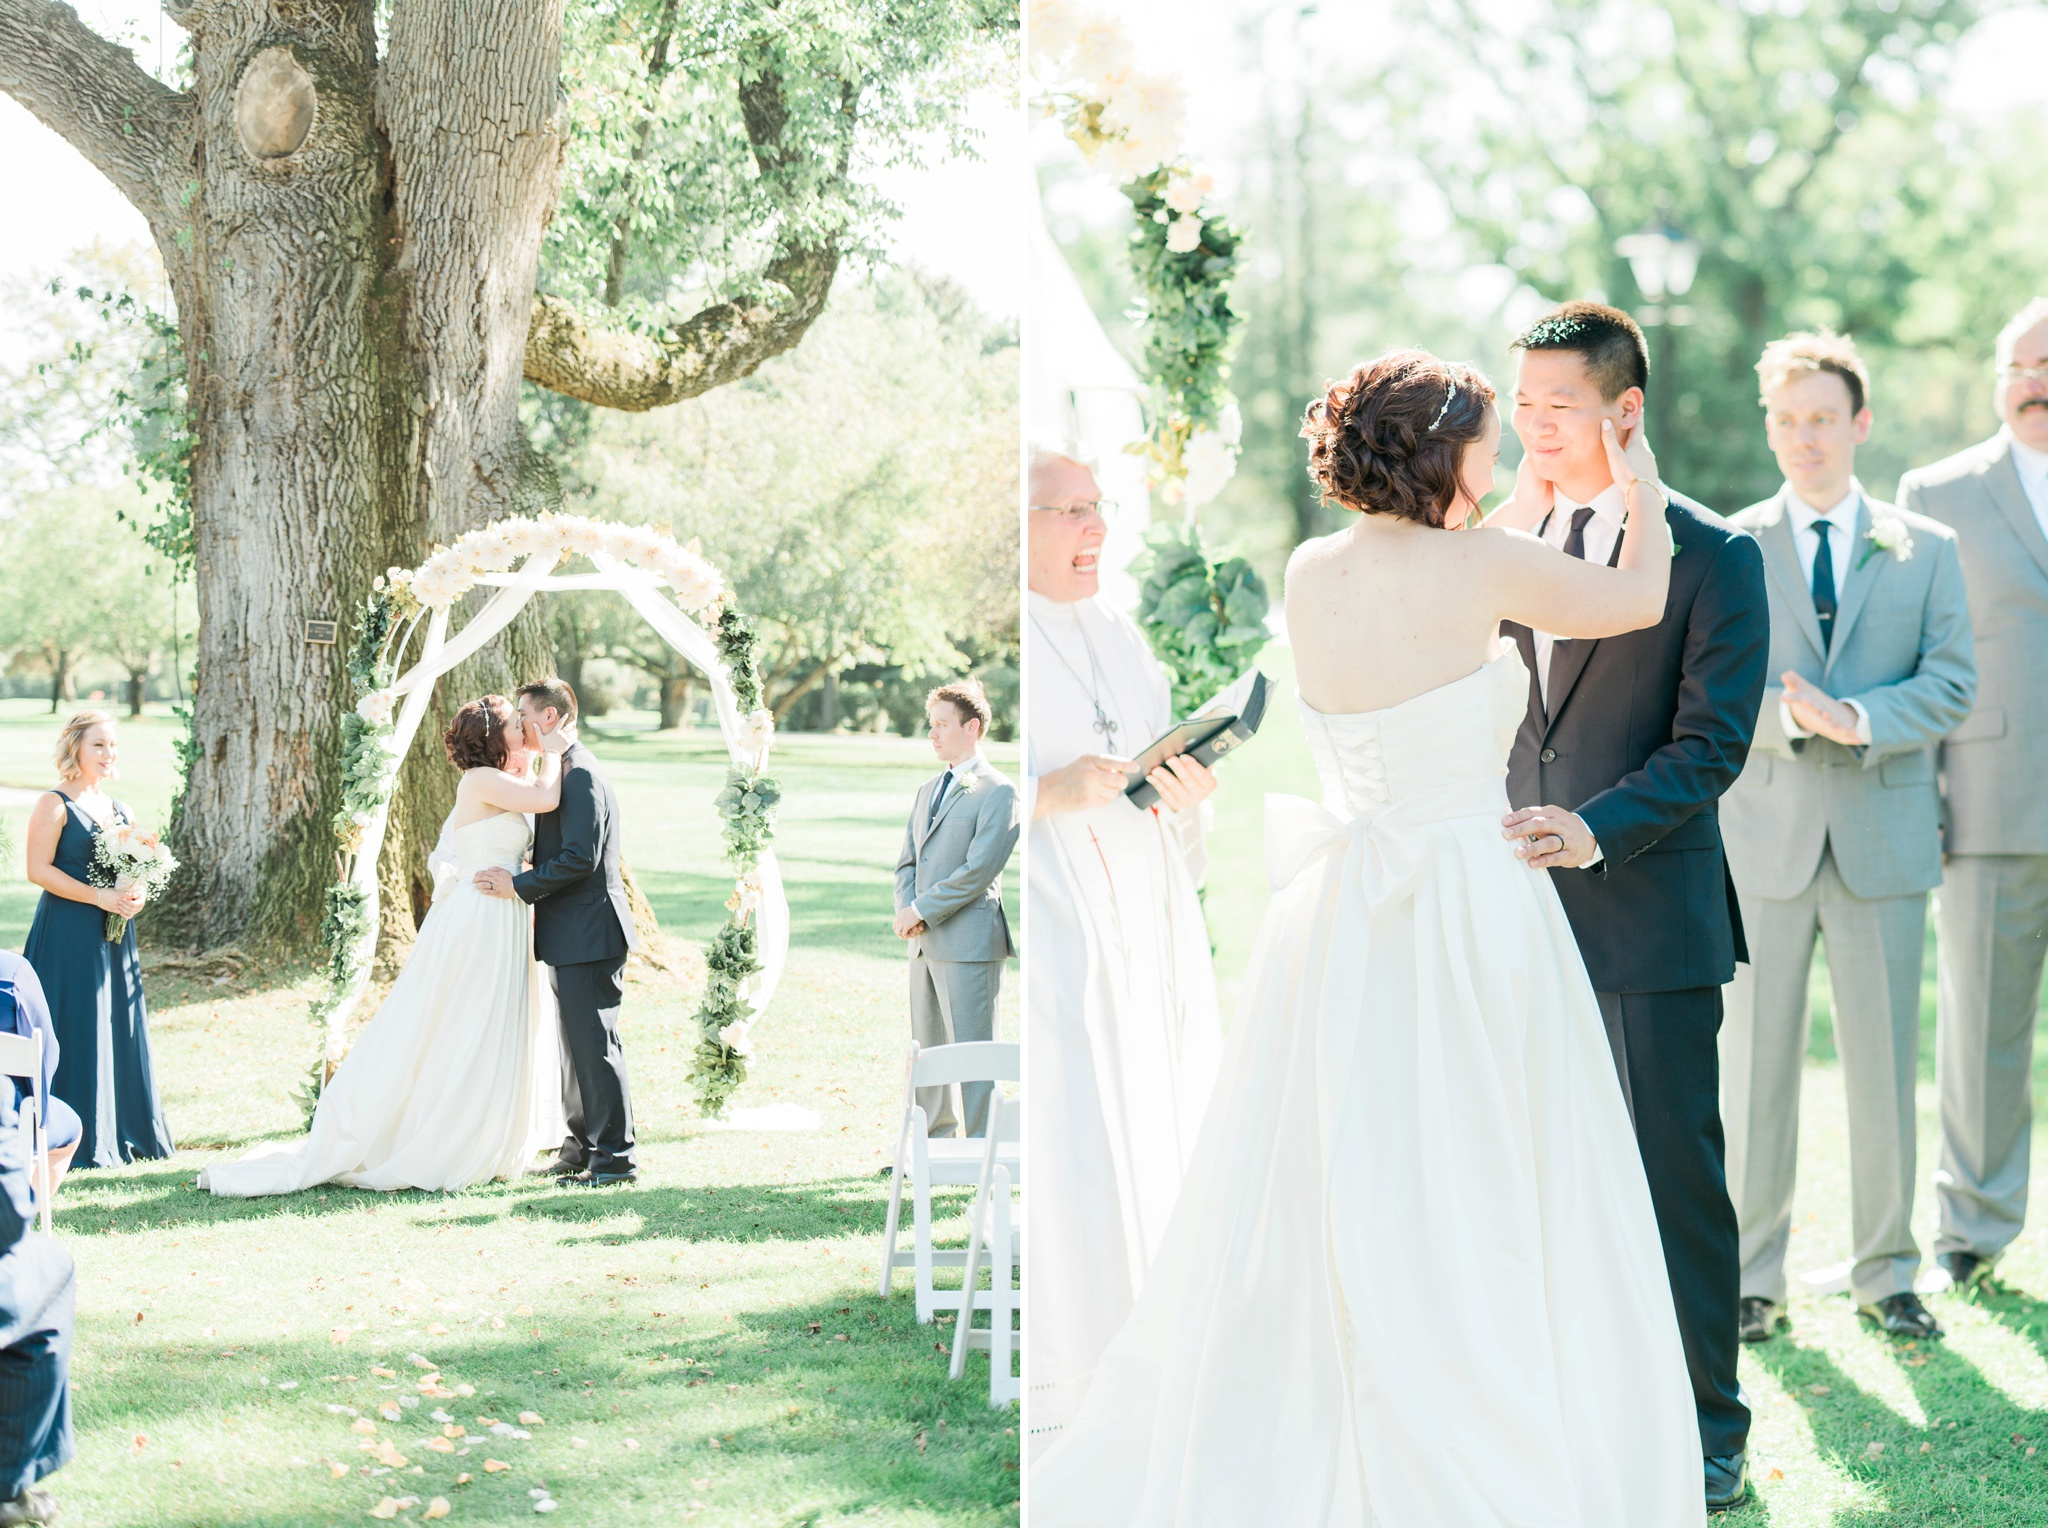 brookside-golf-country-club-wedding-columbus-ohio-69.jpg